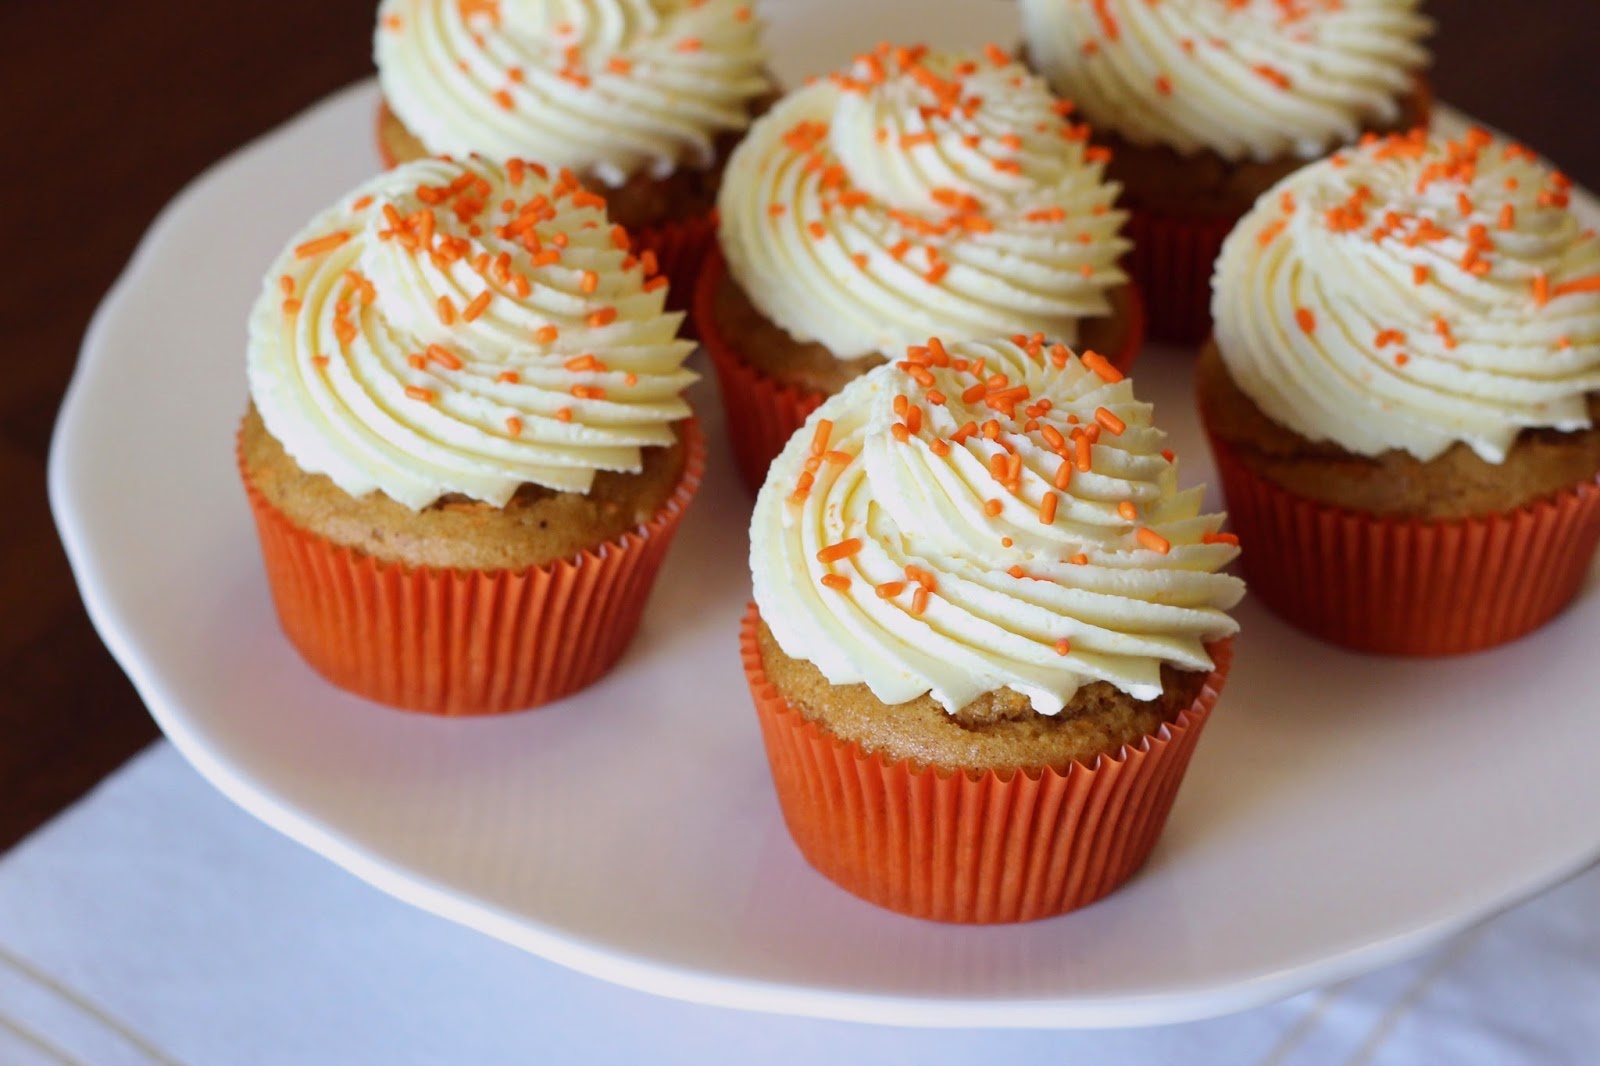 Stuffed Carrot Cake Cupcakes